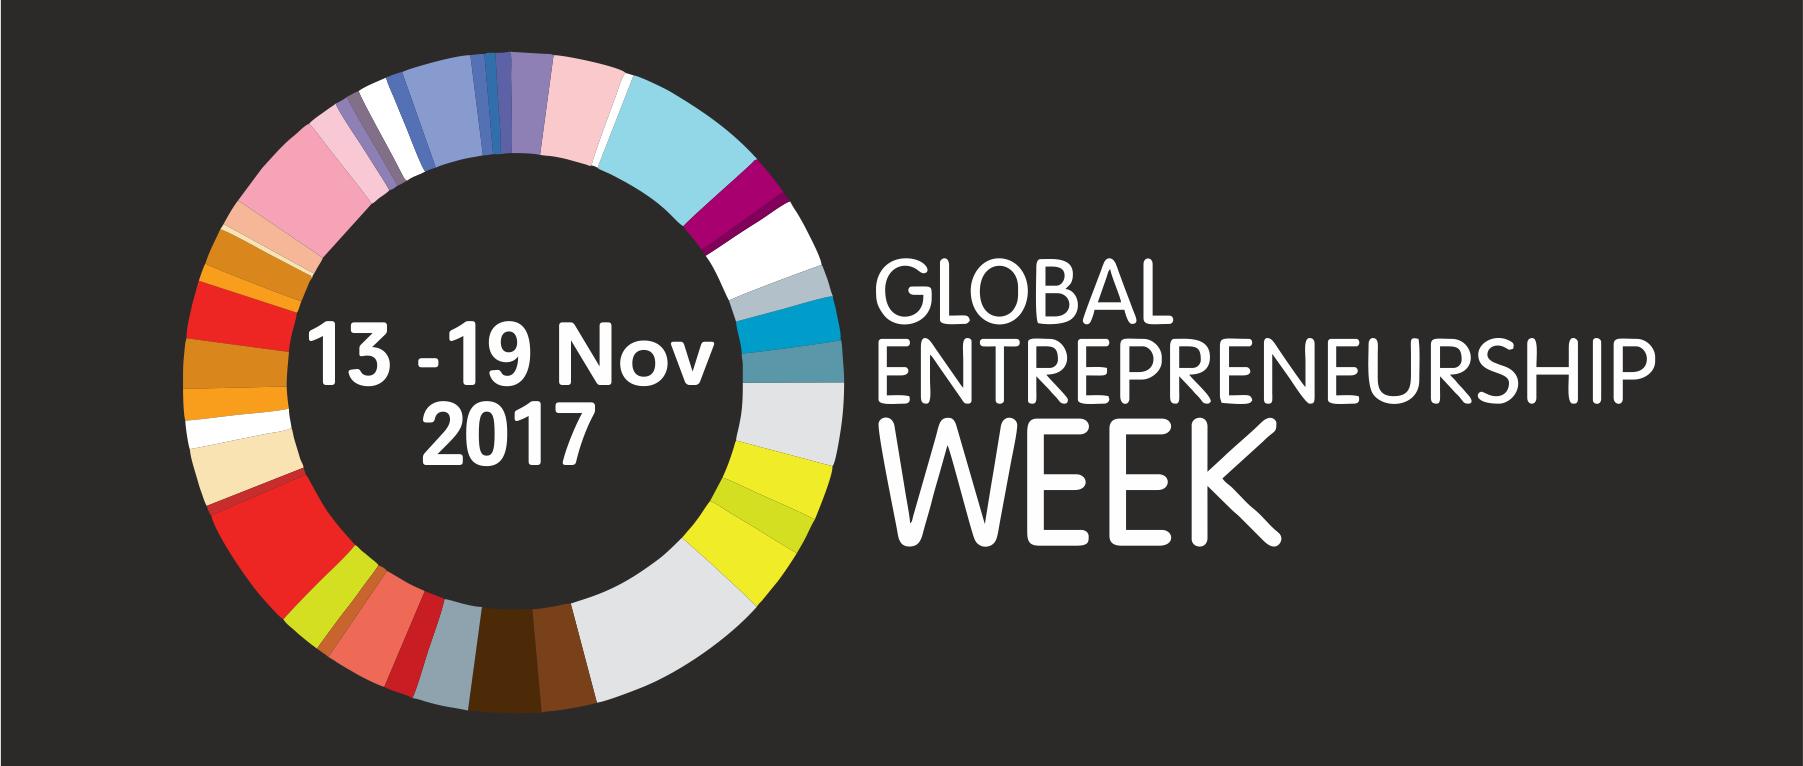 Global Entrepreneurship Week 2017 logo